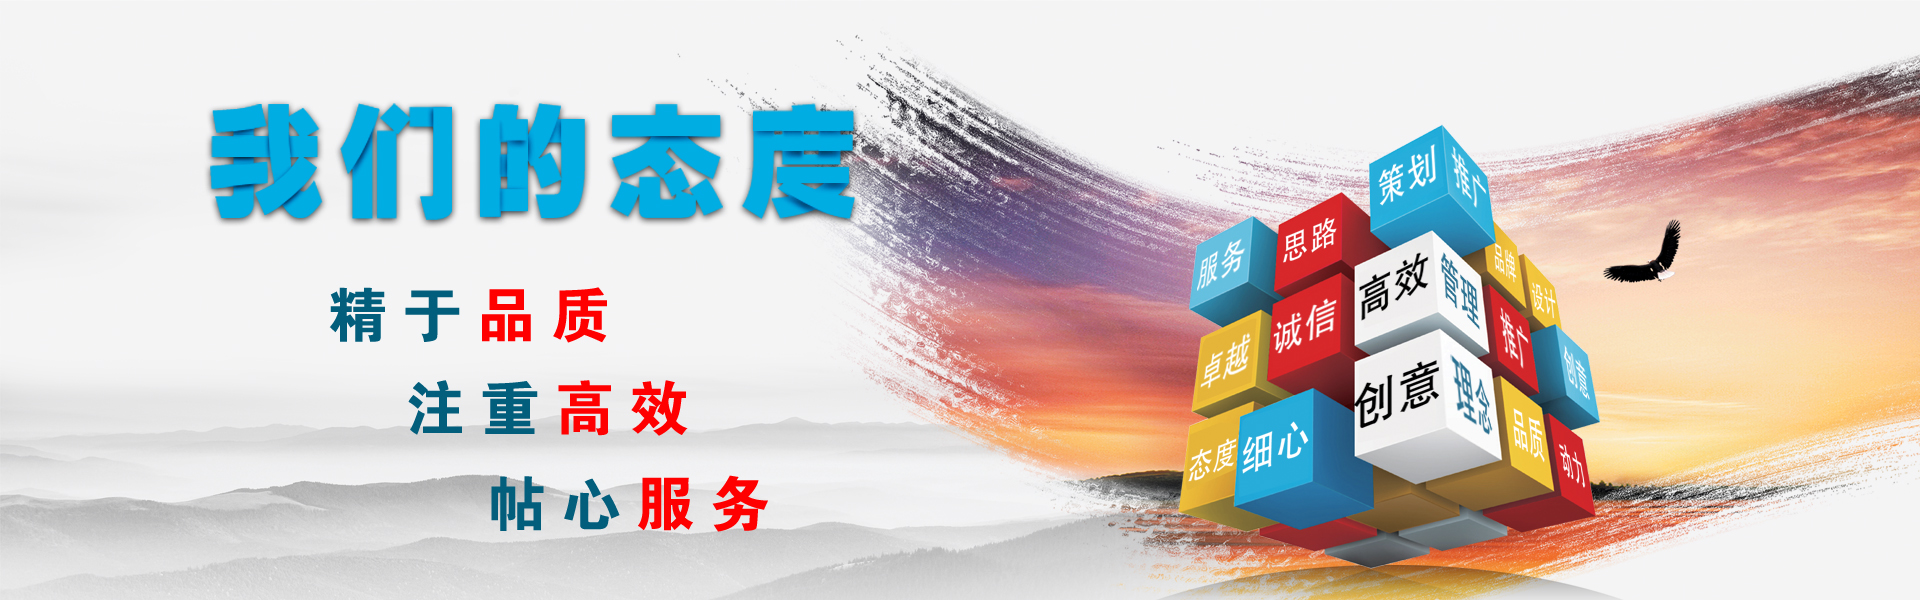 188BET_成都广告公司